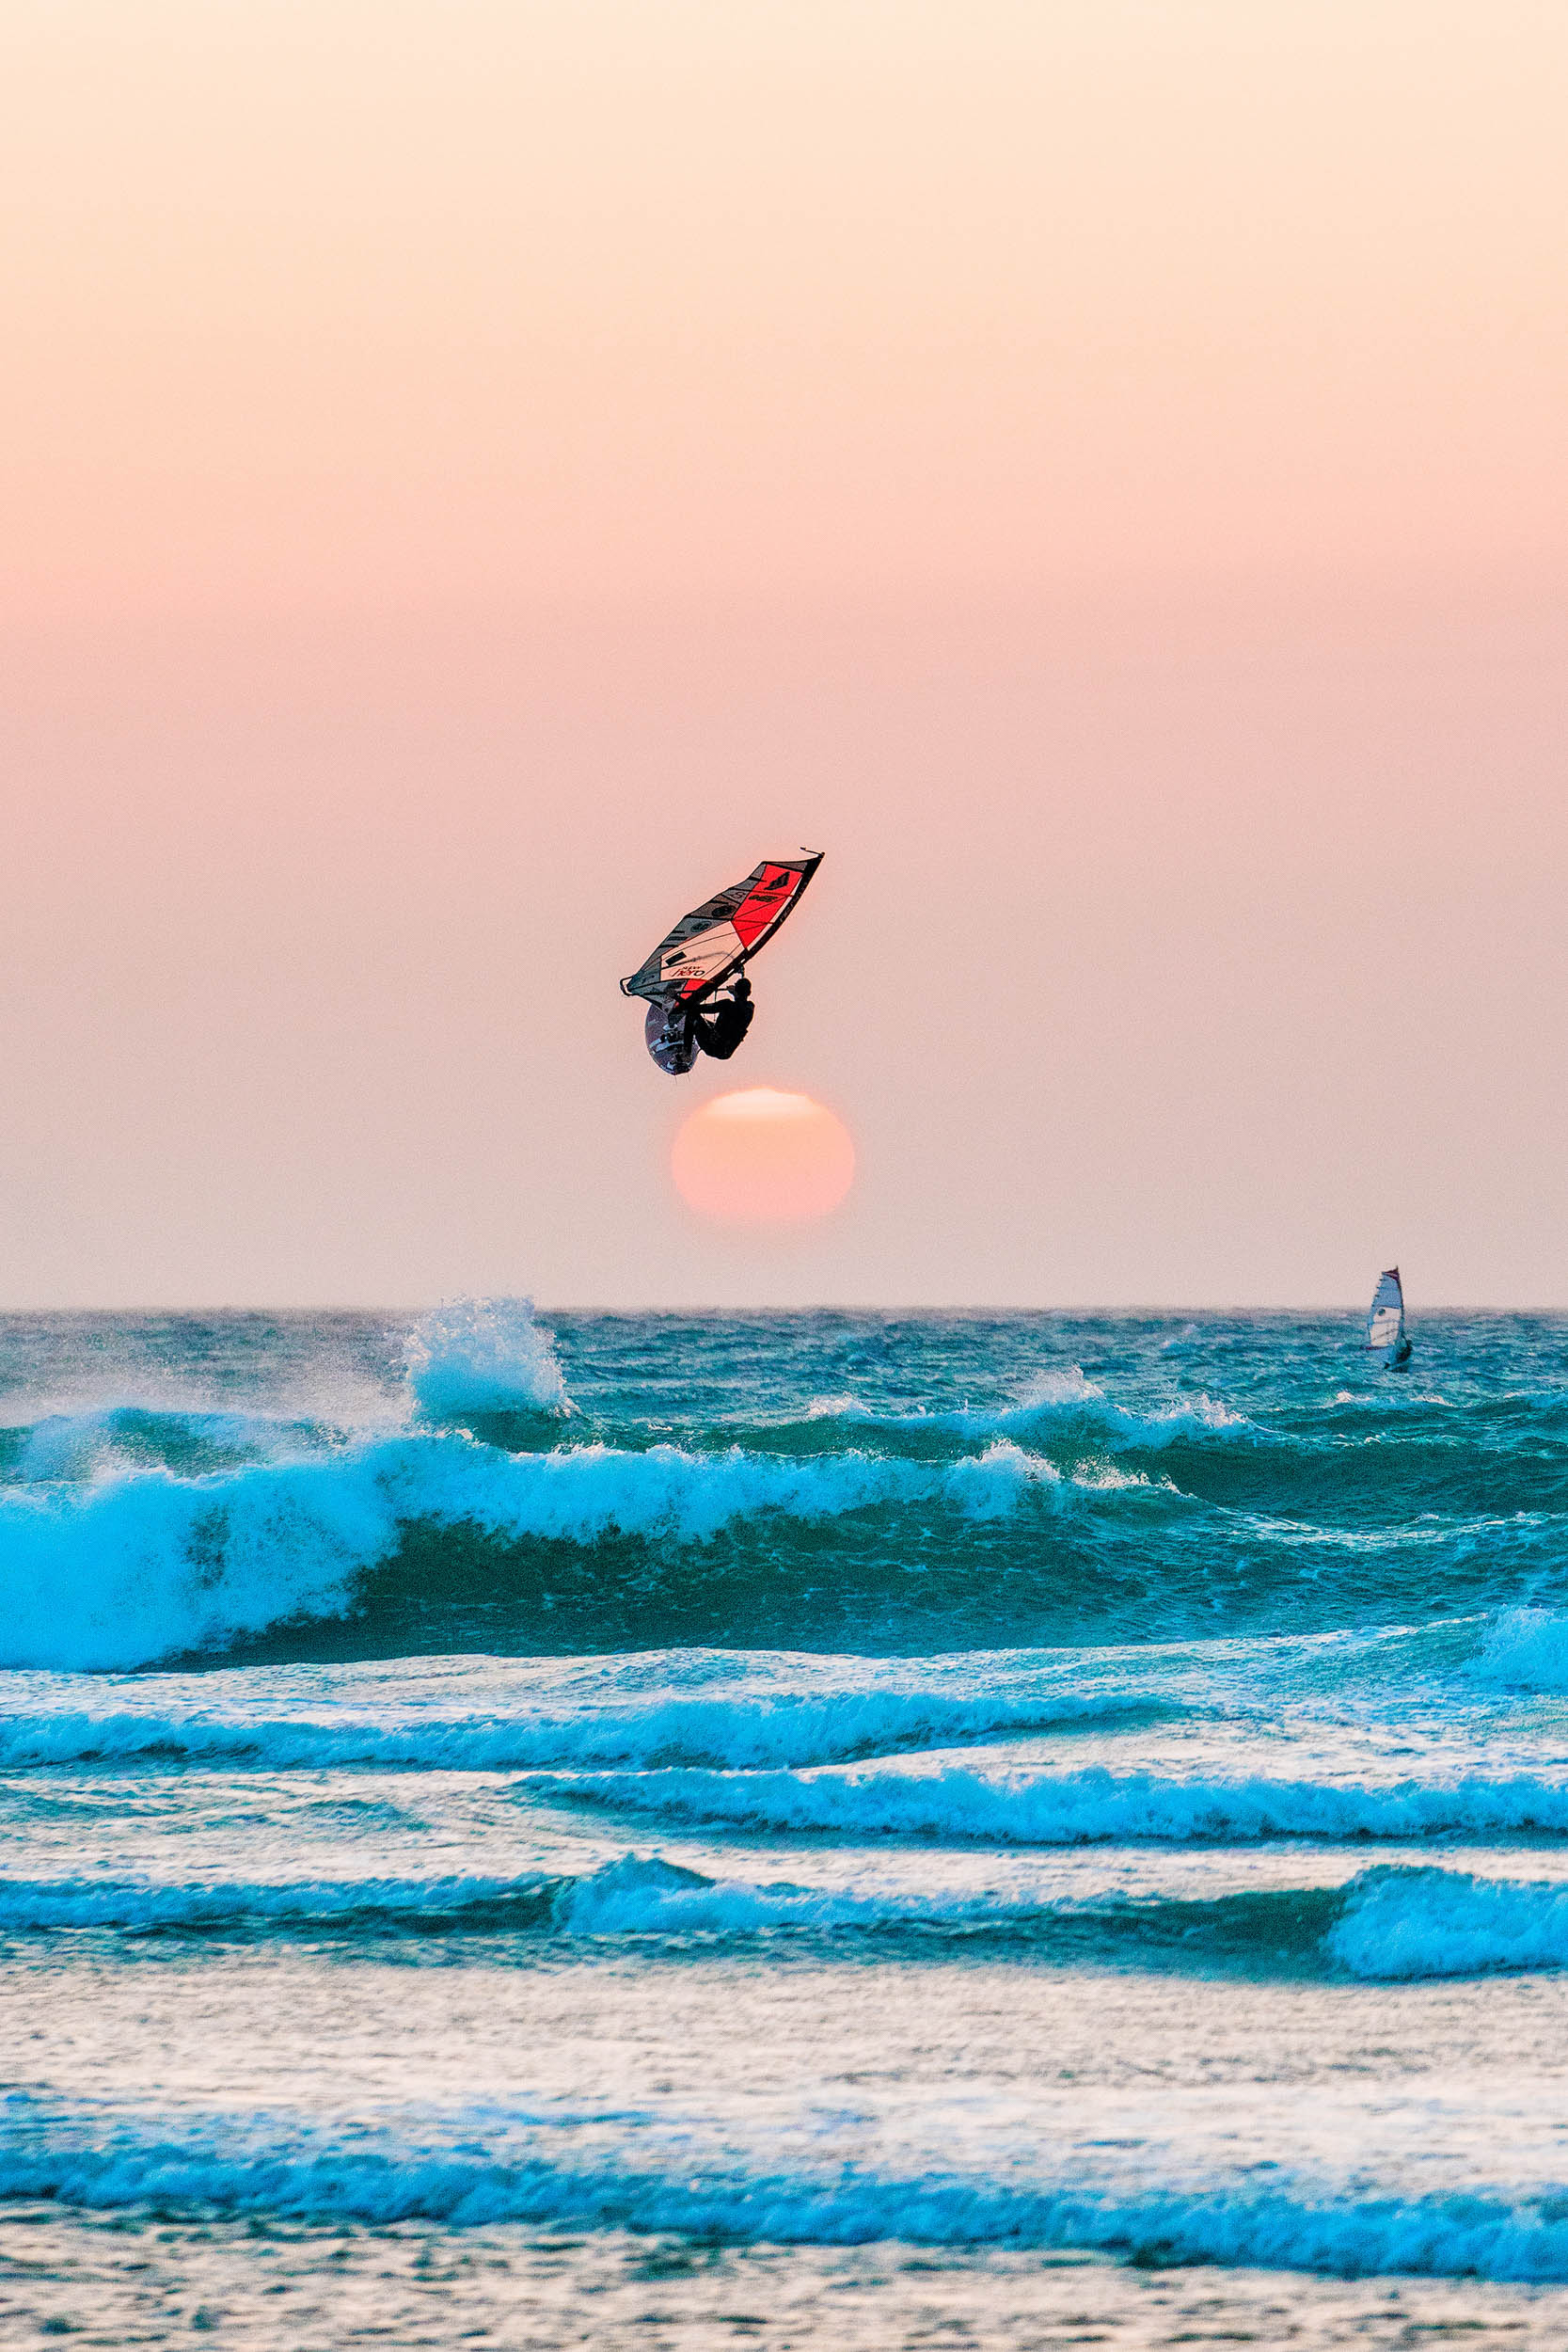 vindsurfare i solnedgång